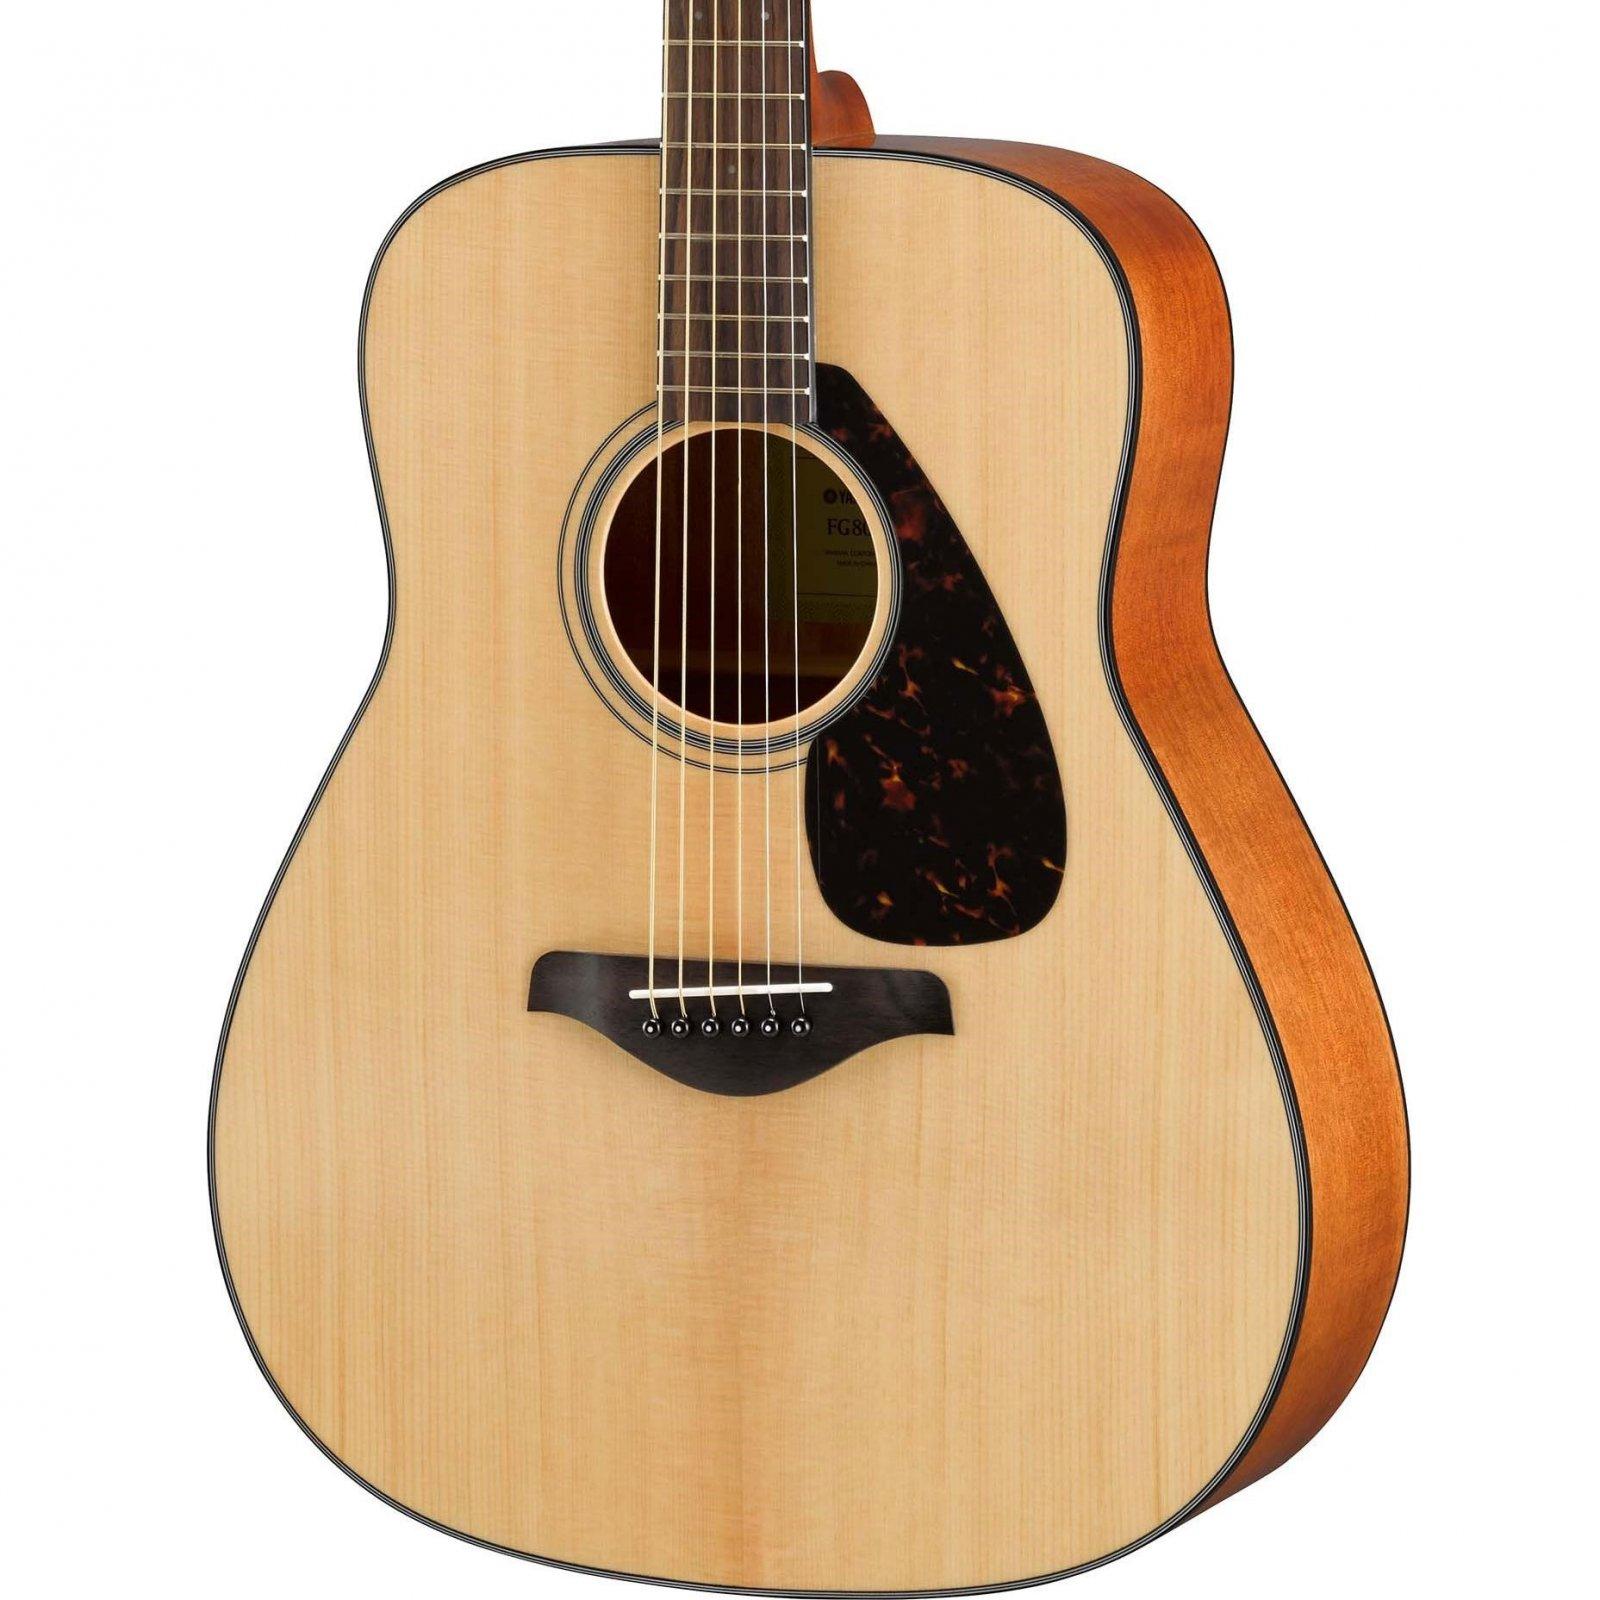 Yamaha FG800 Dreadnought Guitar - Solid Spruce Top - Natural